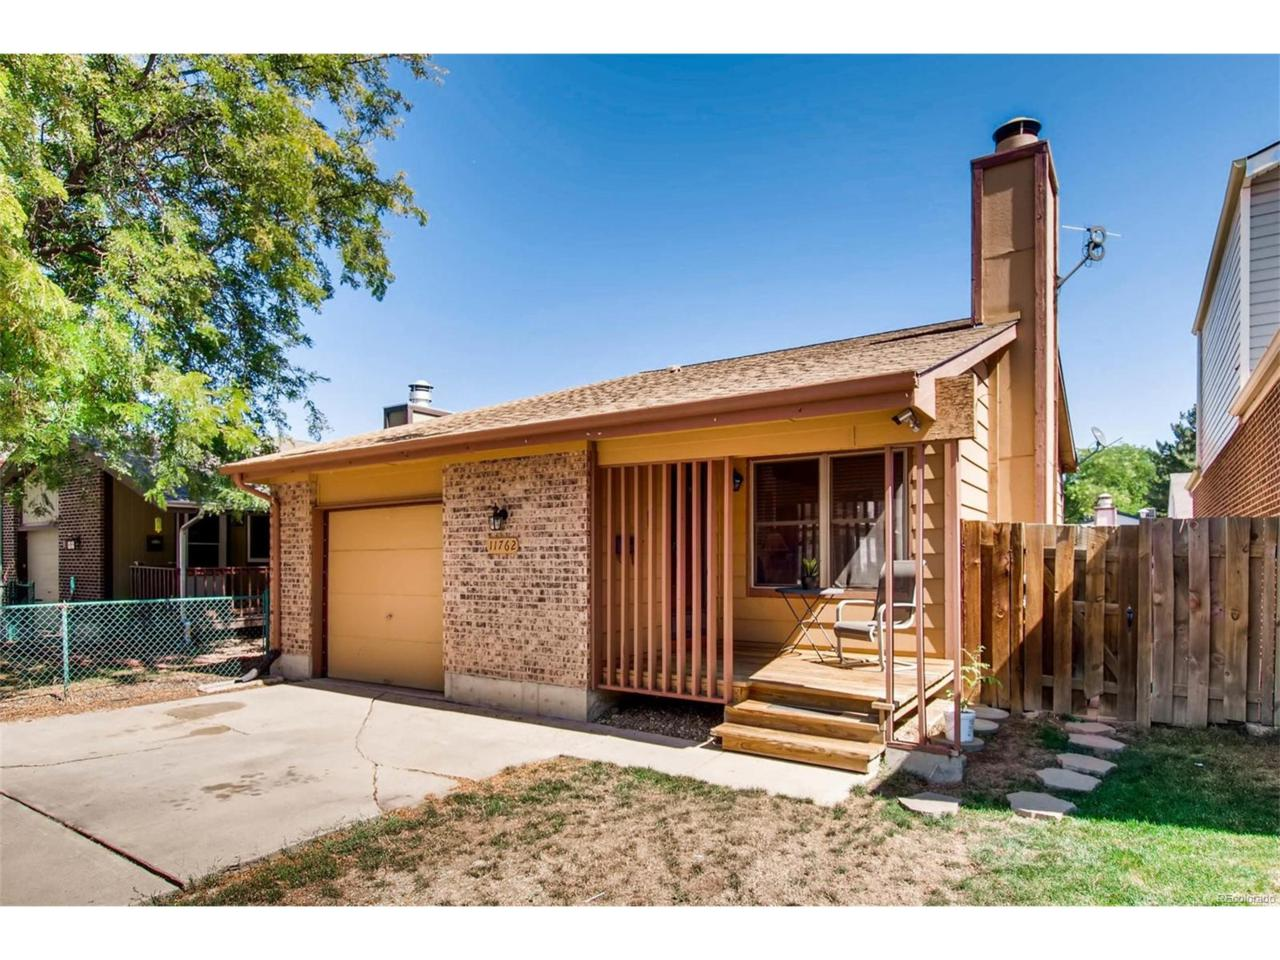 11762 Sherman Street, Northglenn, CO 80233 (MLS #7933094) :: 8z Real Estate